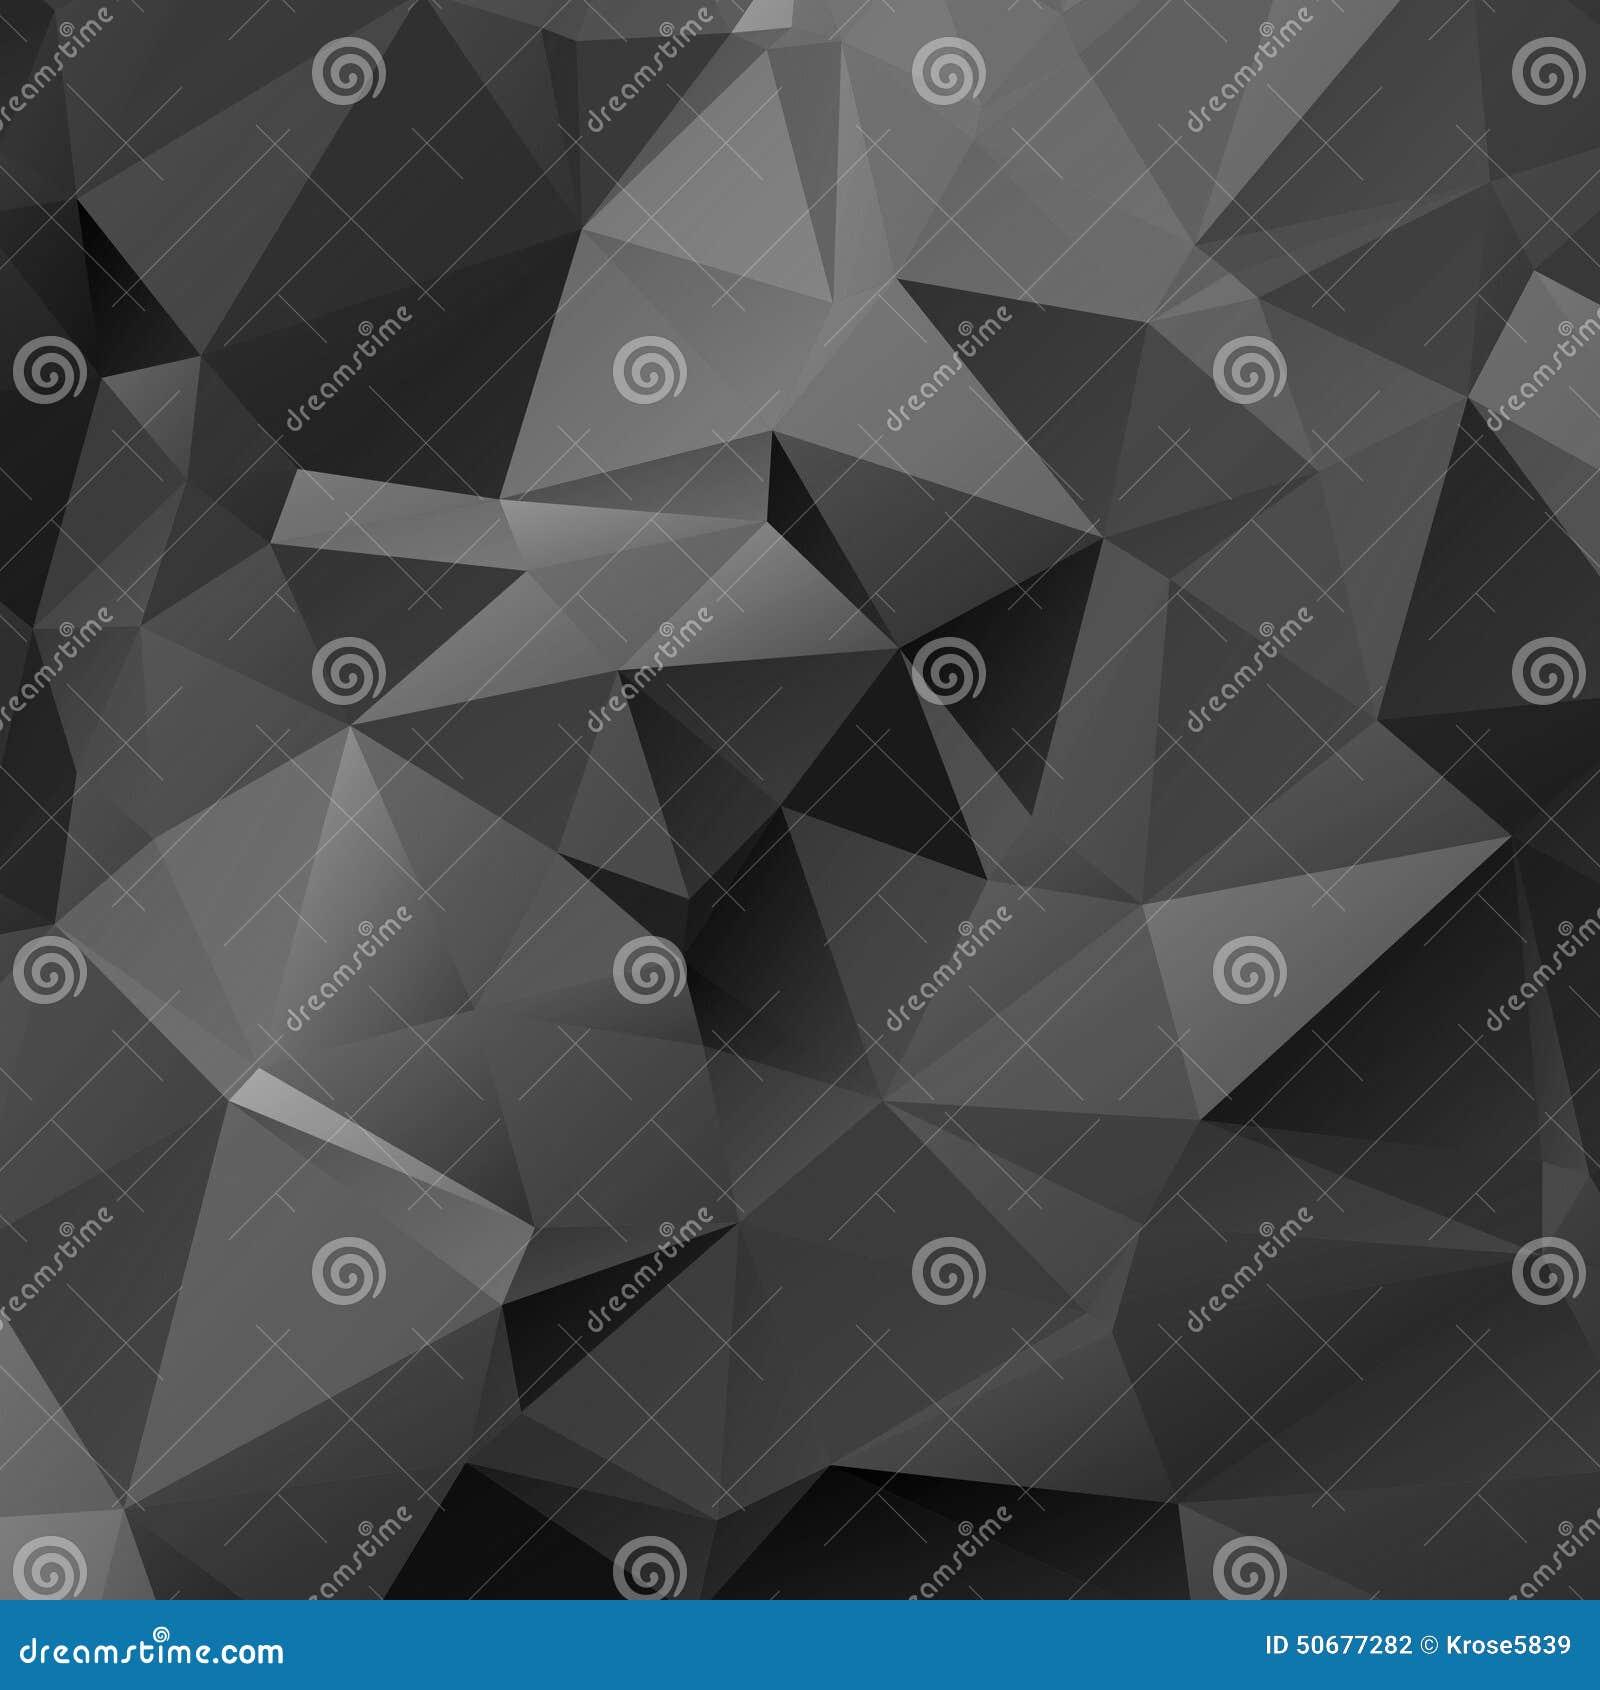 Download 低多彩虹背景 库存照片. 图片 包括有 背包, 数字式, 灰色, 天空, 蓝色, 抽象, 云彩, 花卉, 彩虹 - 50677282